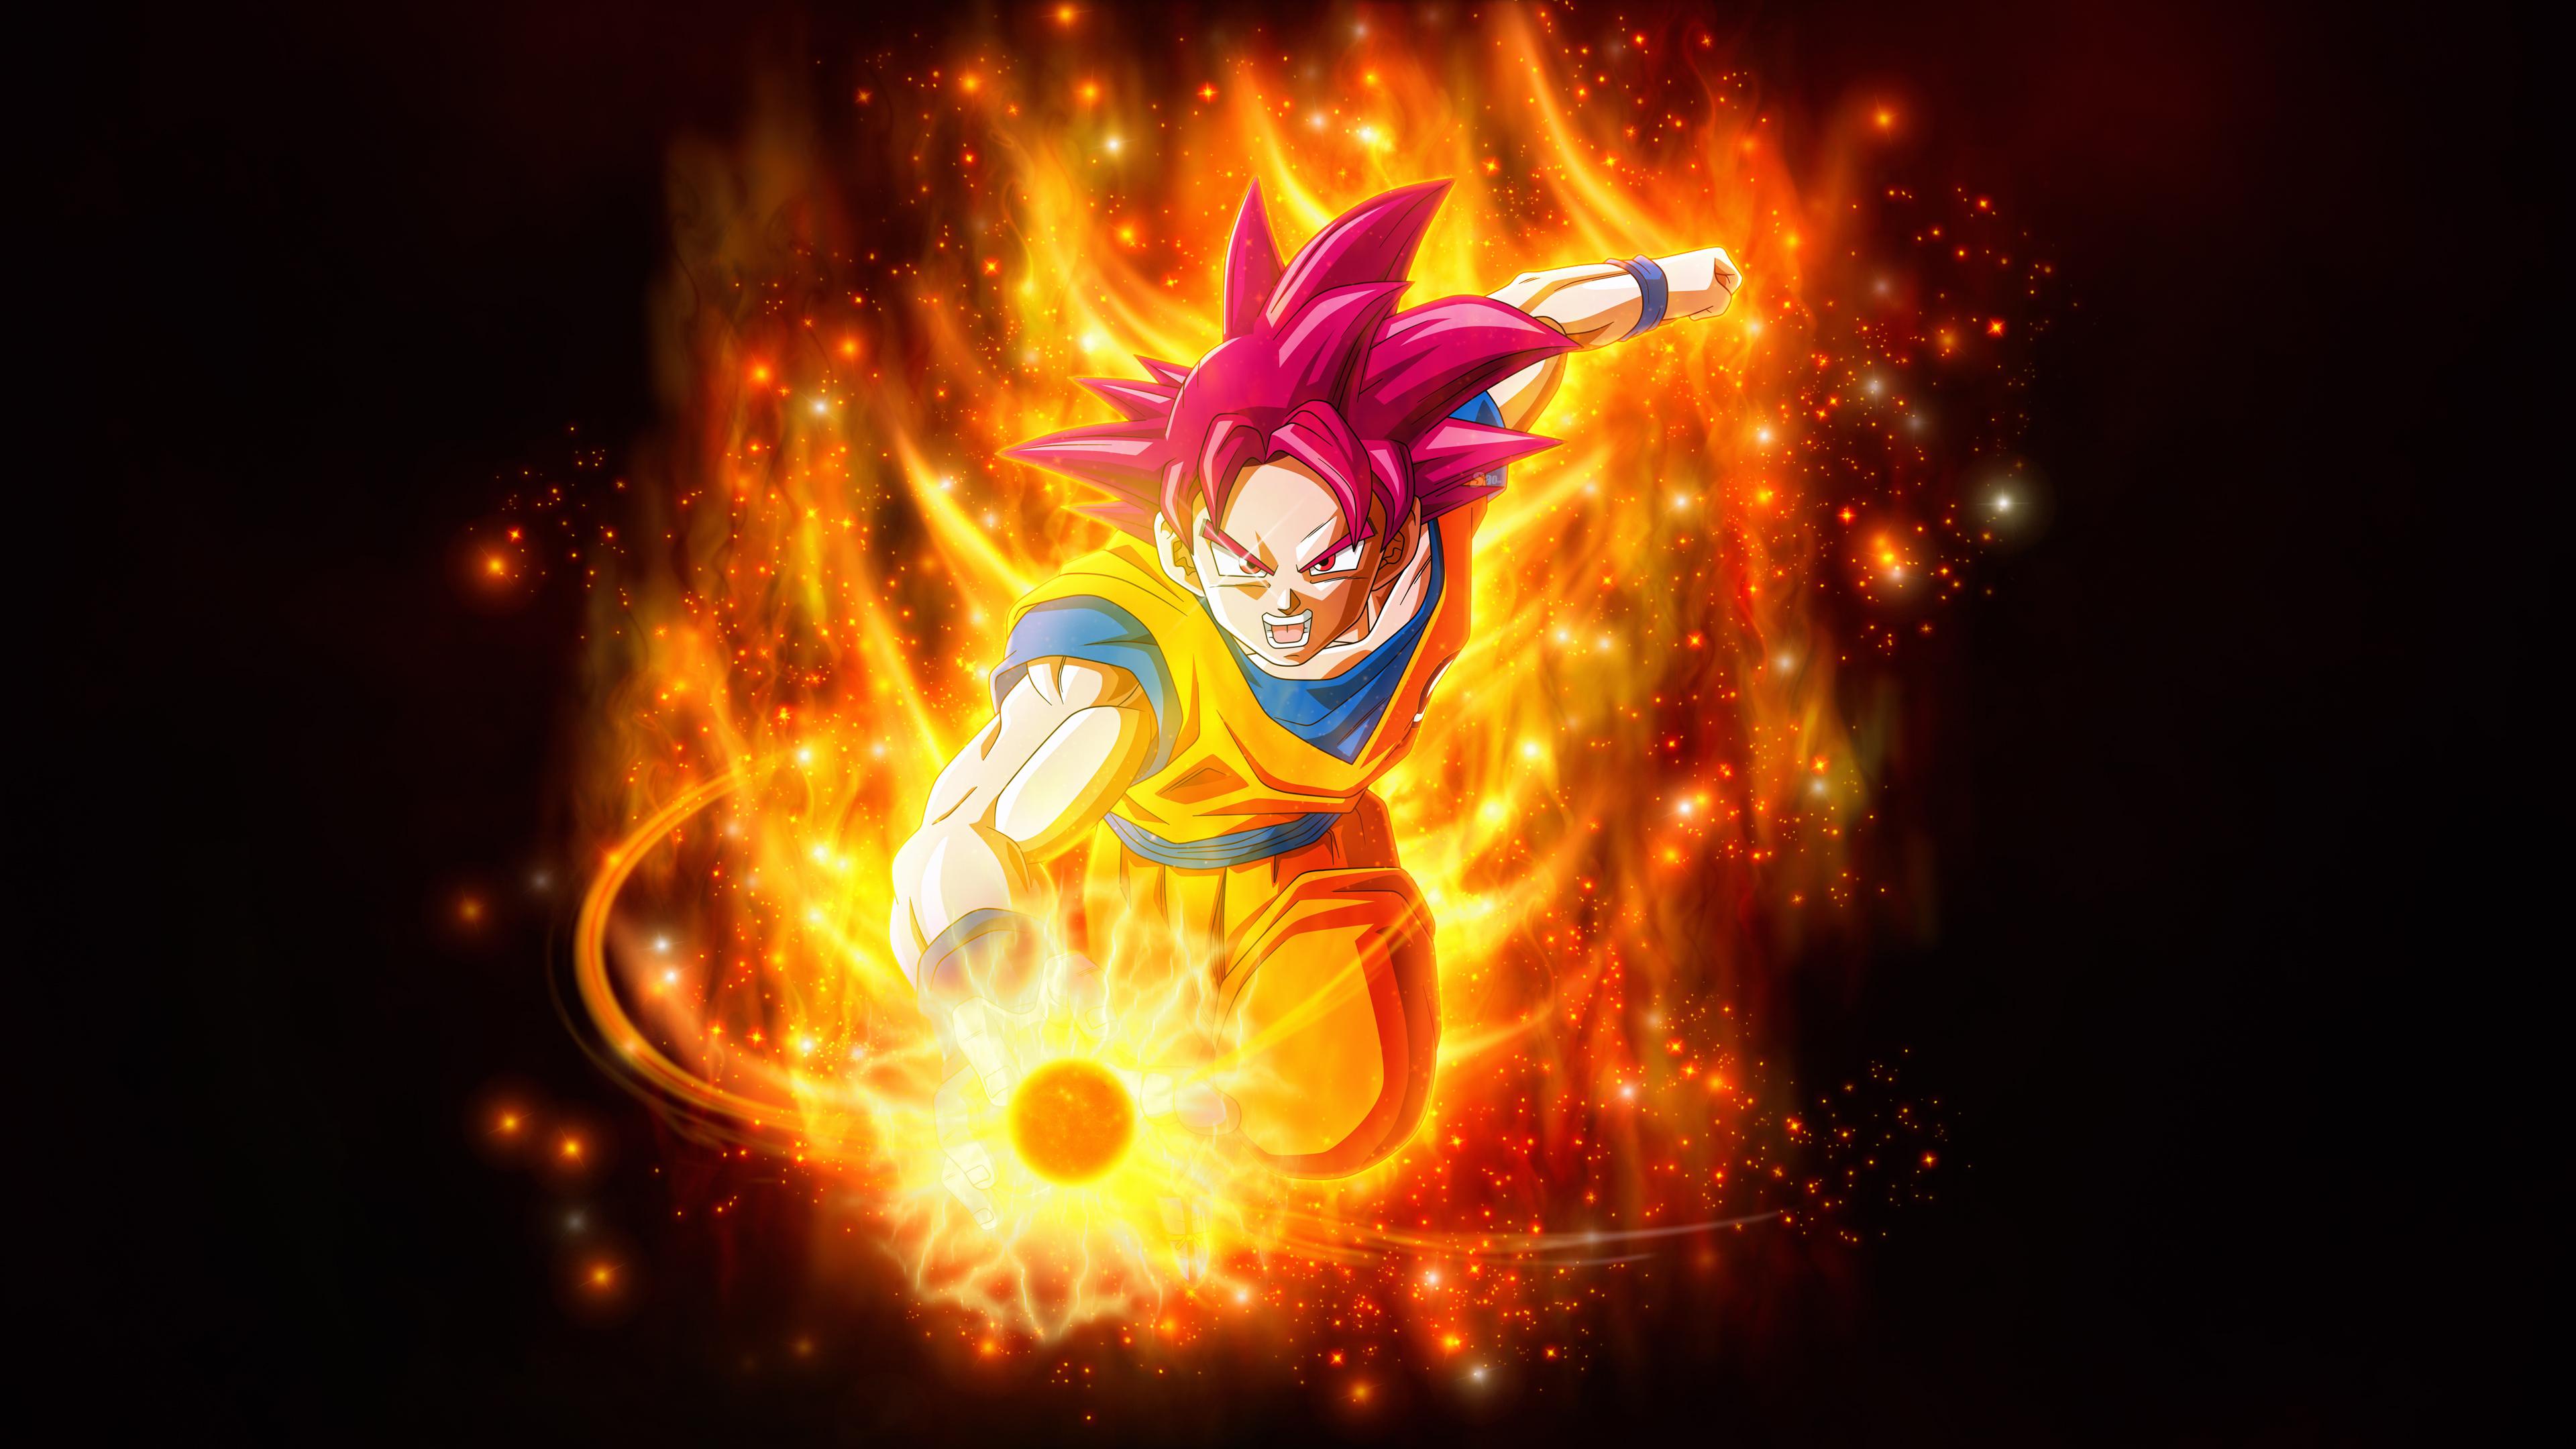 dragon ball super super saiyan goku 1541974502 - Dragon Ball Super Super Saiyan Goku - hd-wallpapers, goku wallpapers, dragon ball wallpapers, dragon ball super wallpapers, anime wallpapers, 4k-wallpapers